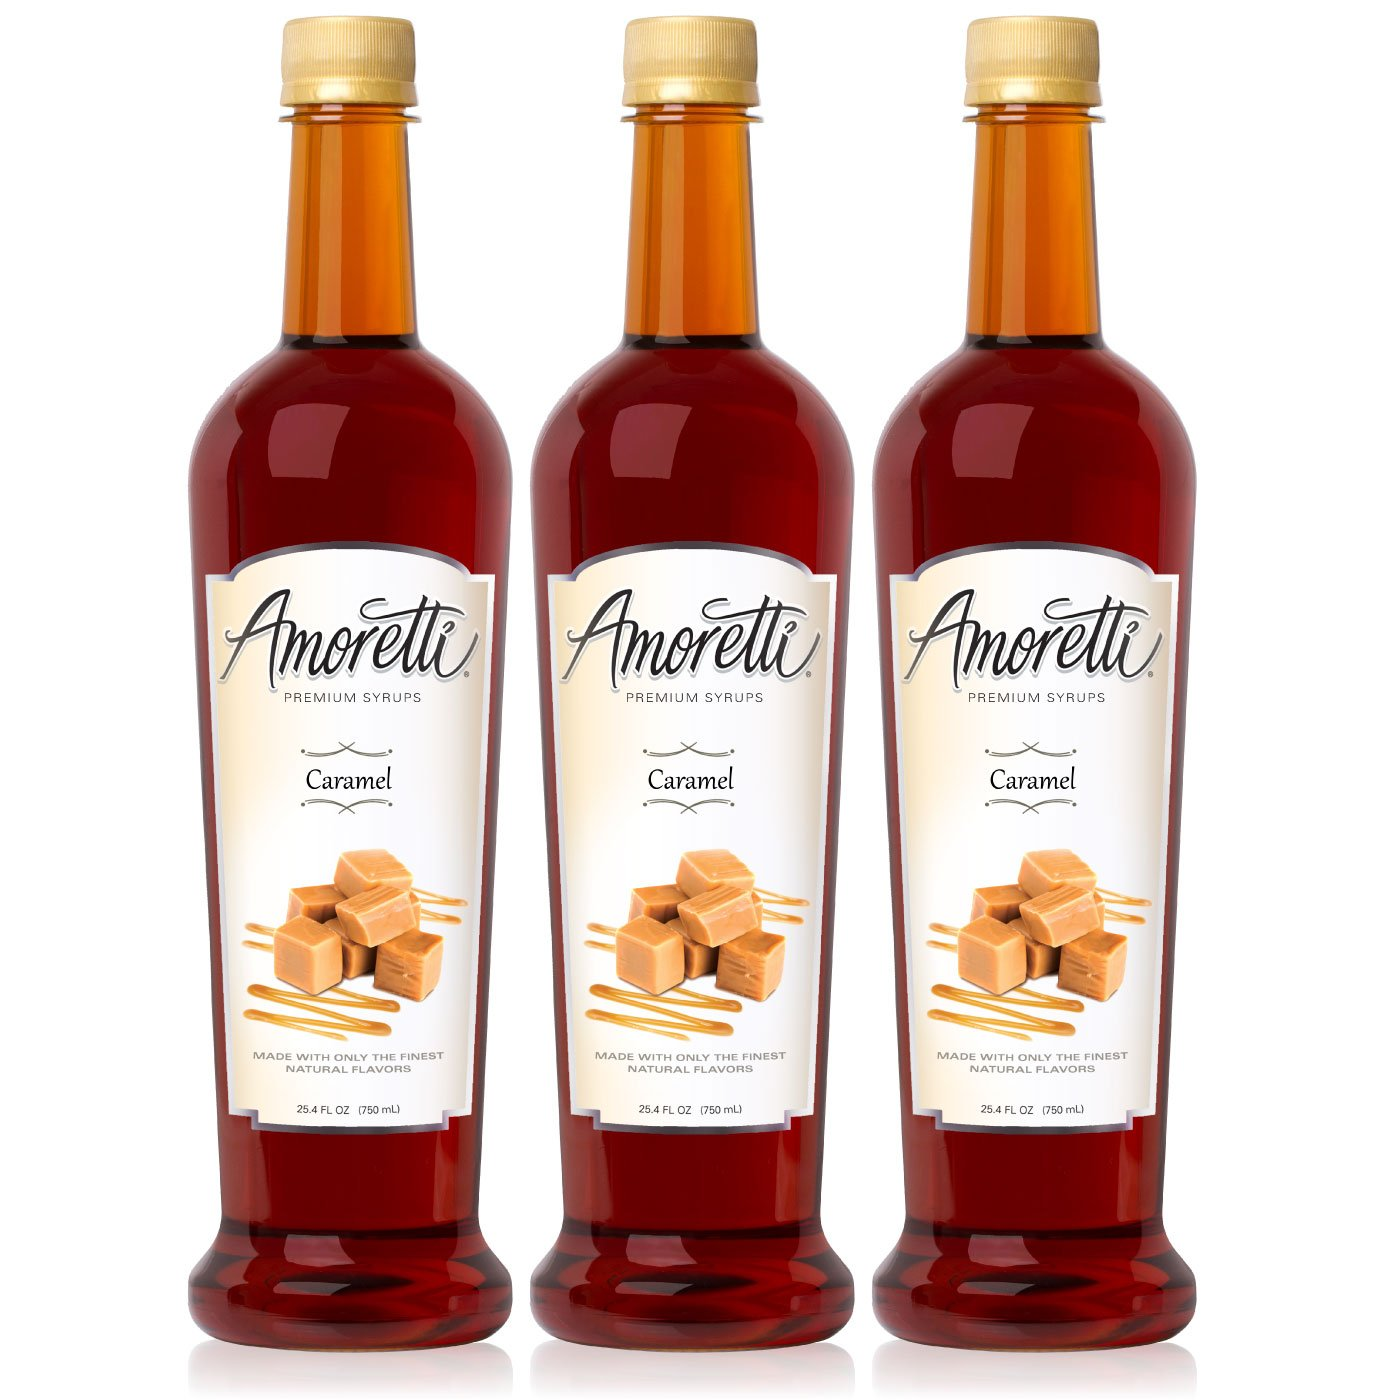 Amoretti Premium Caramel Syrup 750ml 3 Pack